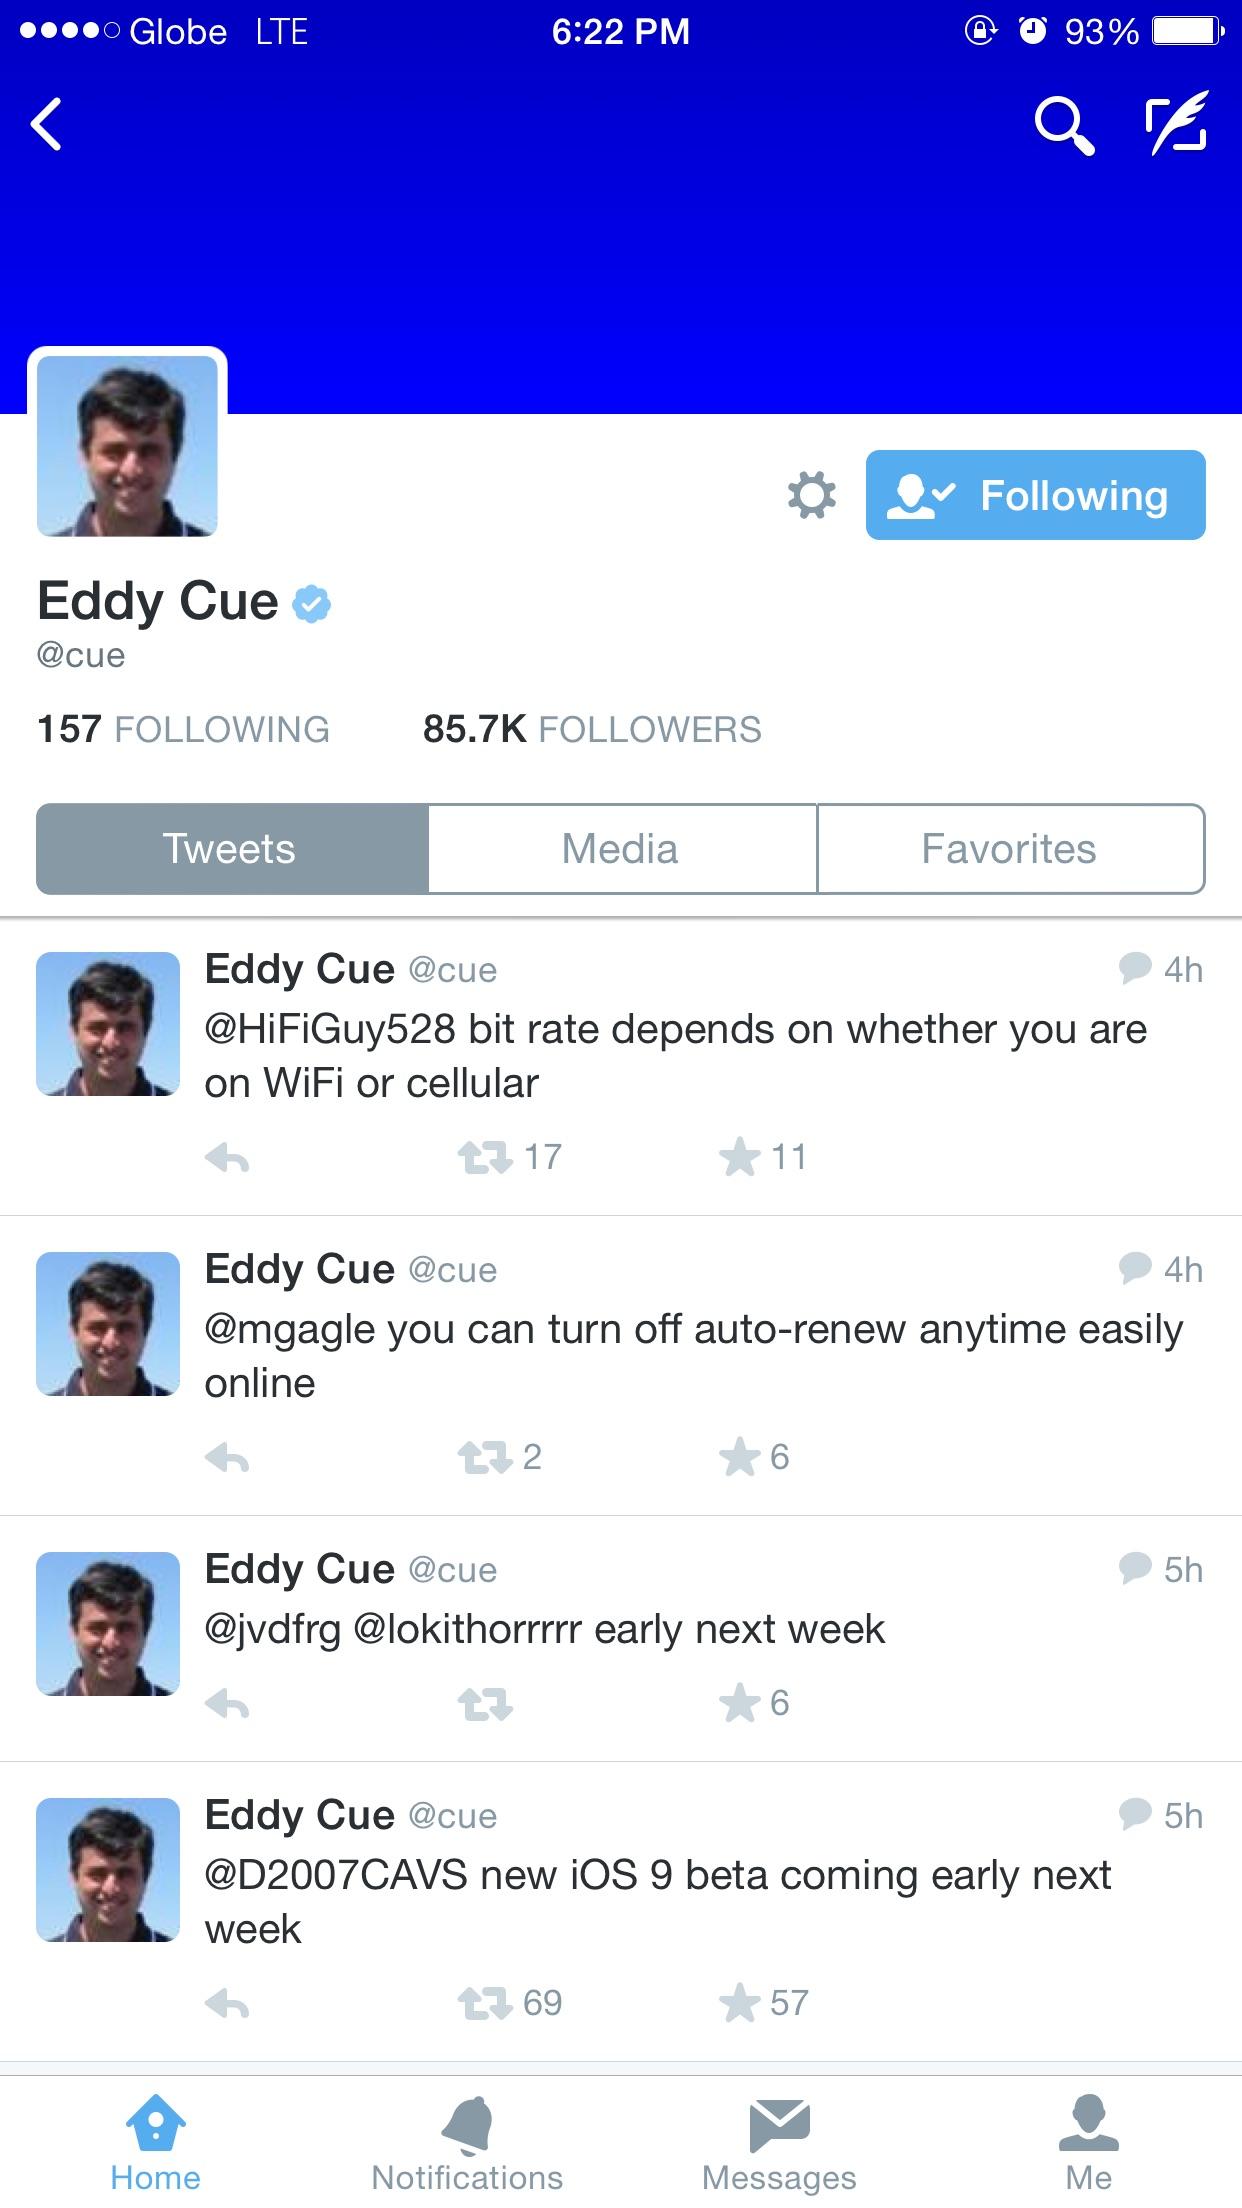 Eddy Cue on Twitter